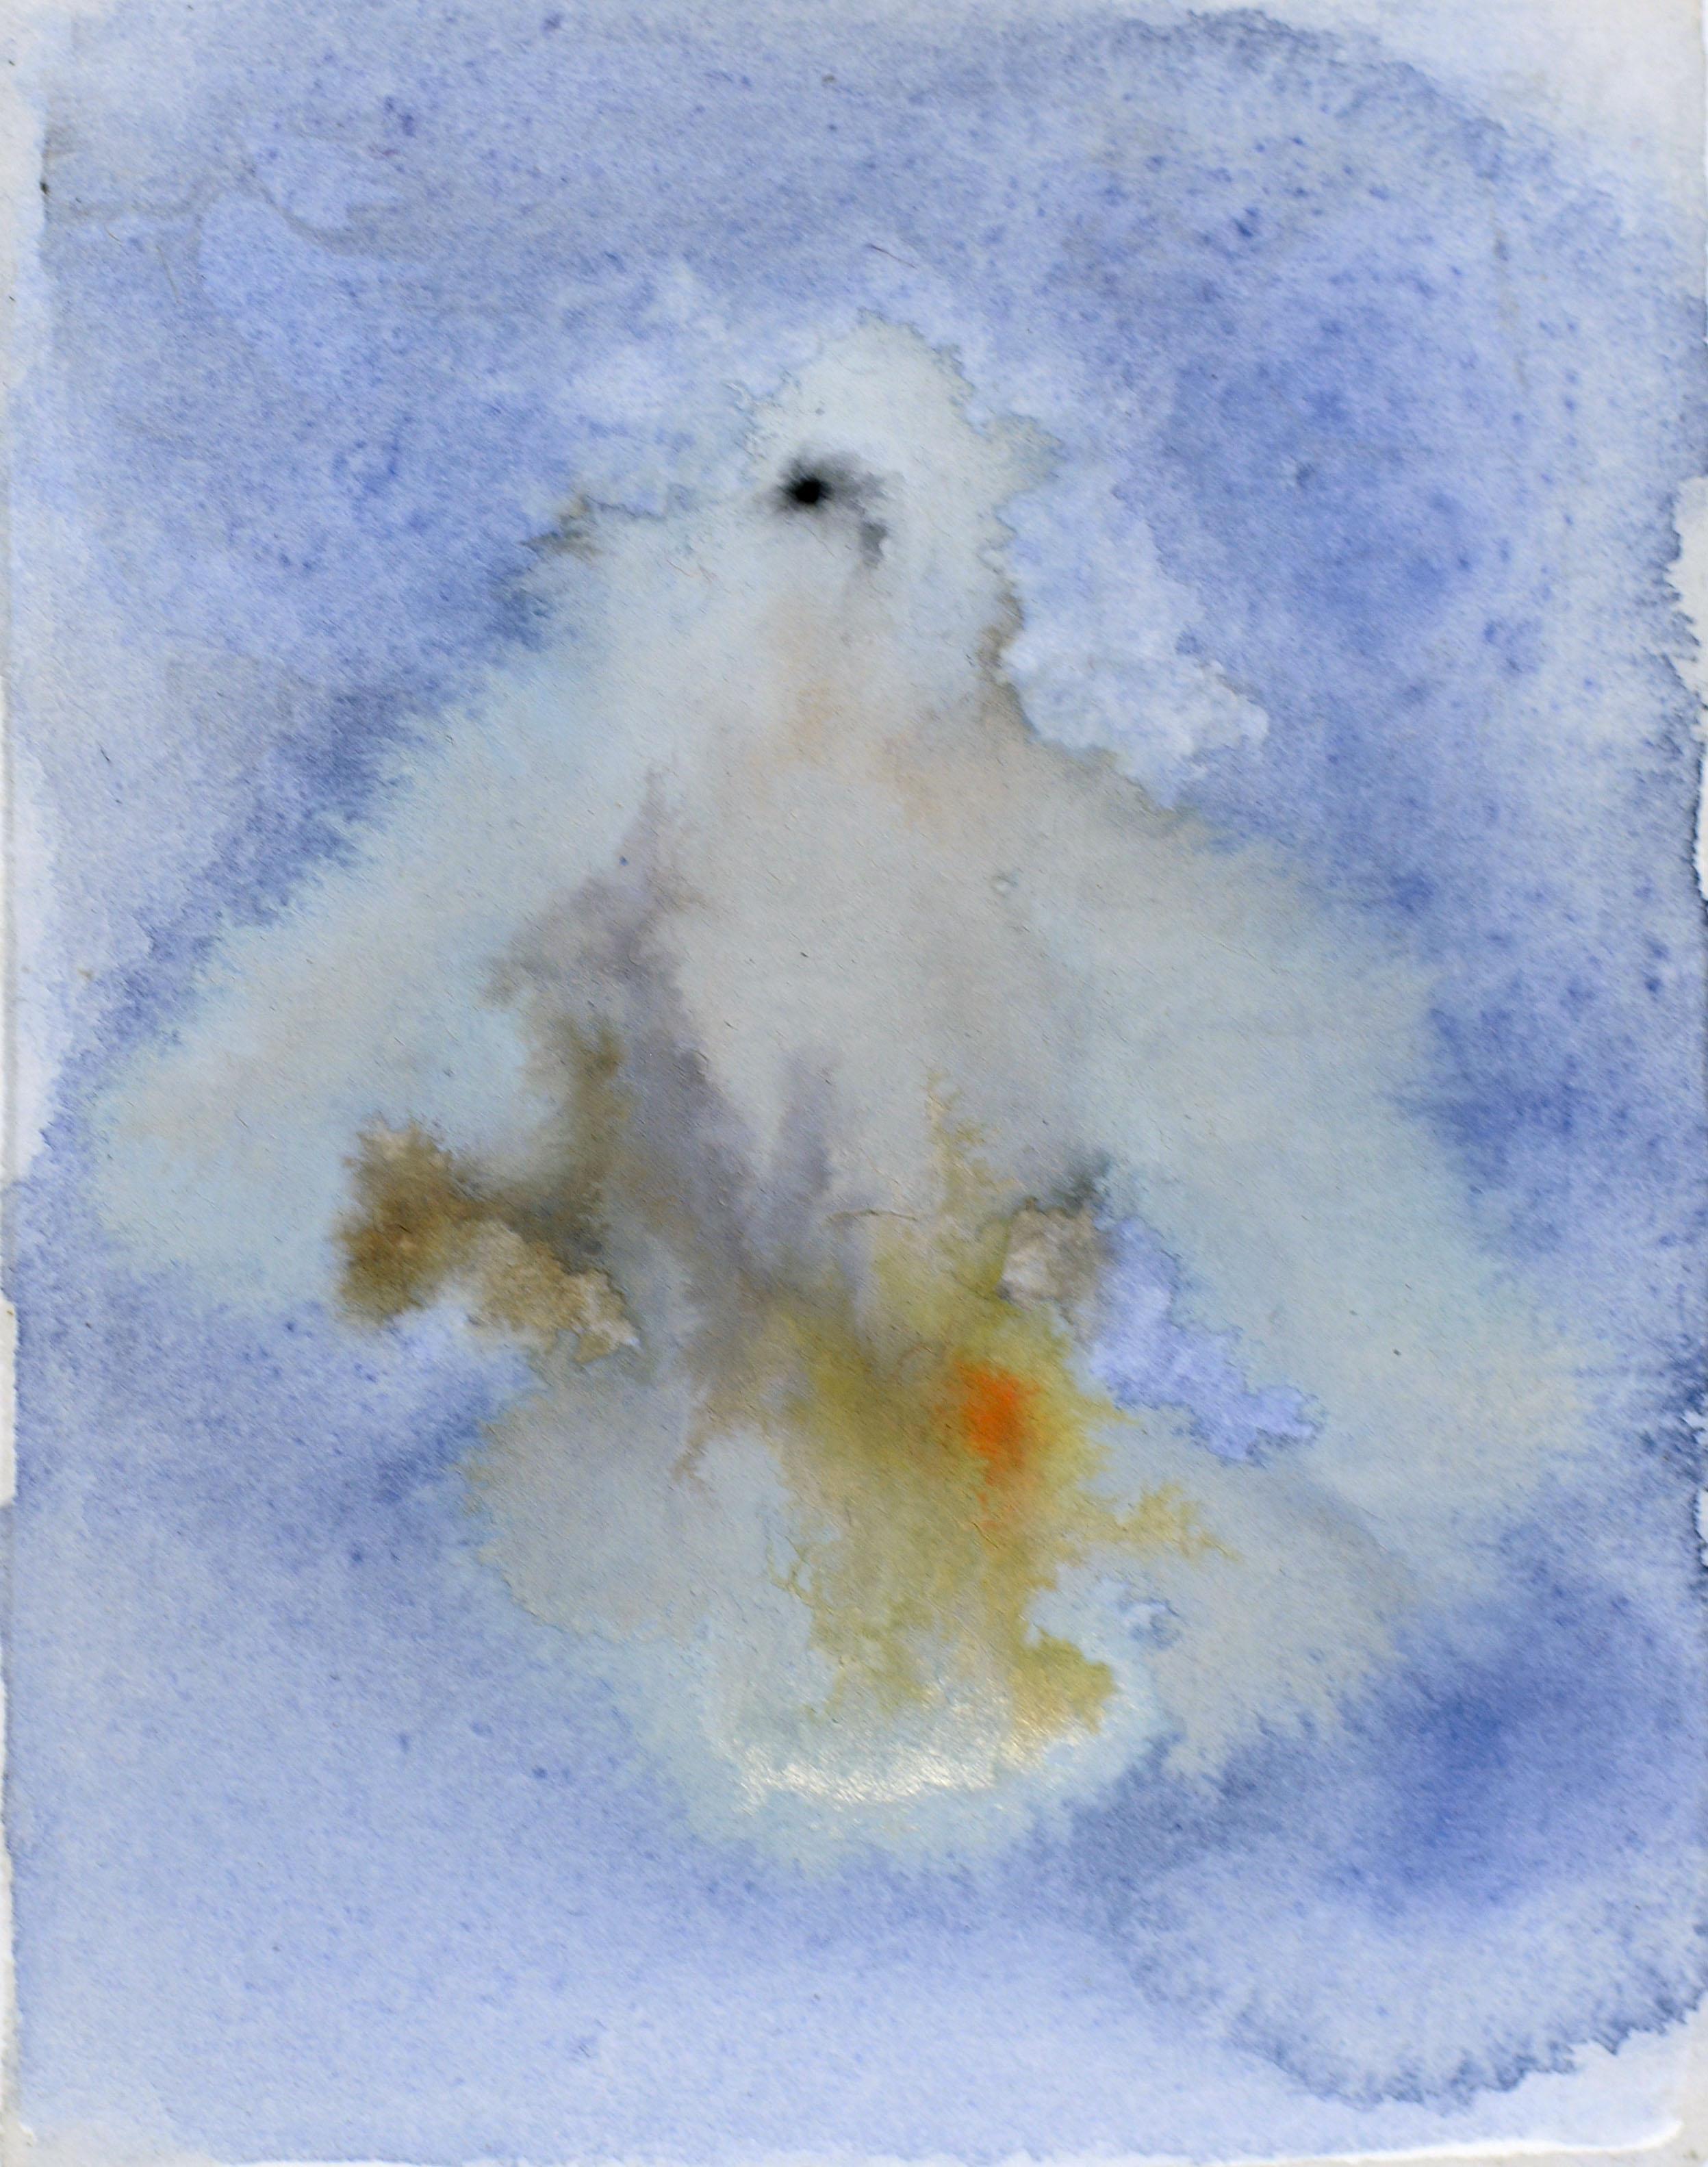 Rebecca_Kinkead_White Dove (Day)_4x3 inset on 11x7.5.jpg